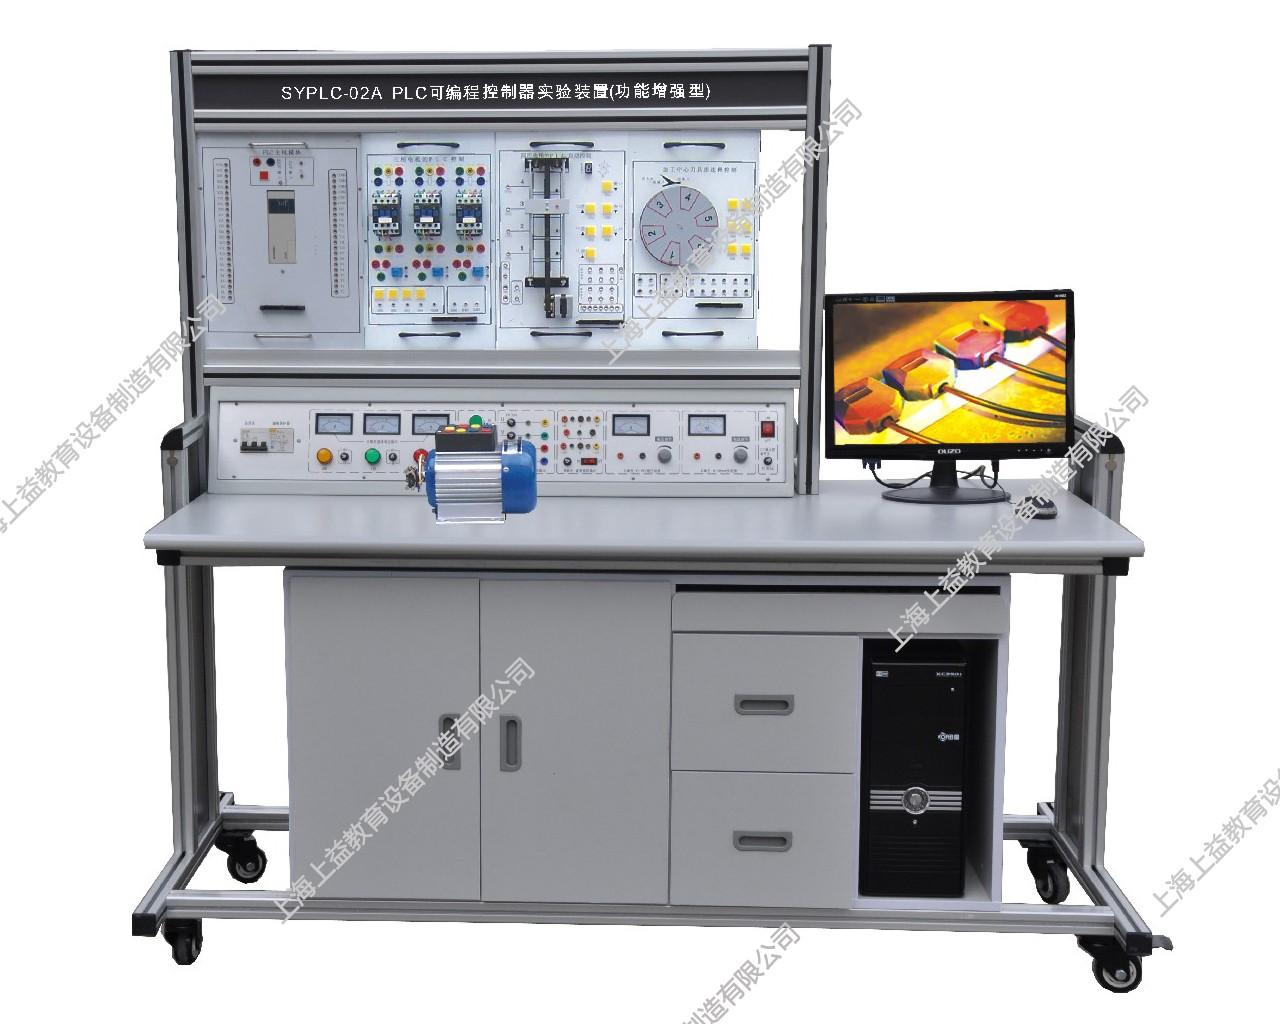 SYPLC-011APLC可编程控制器实验装置(立式、挂箱积木式)